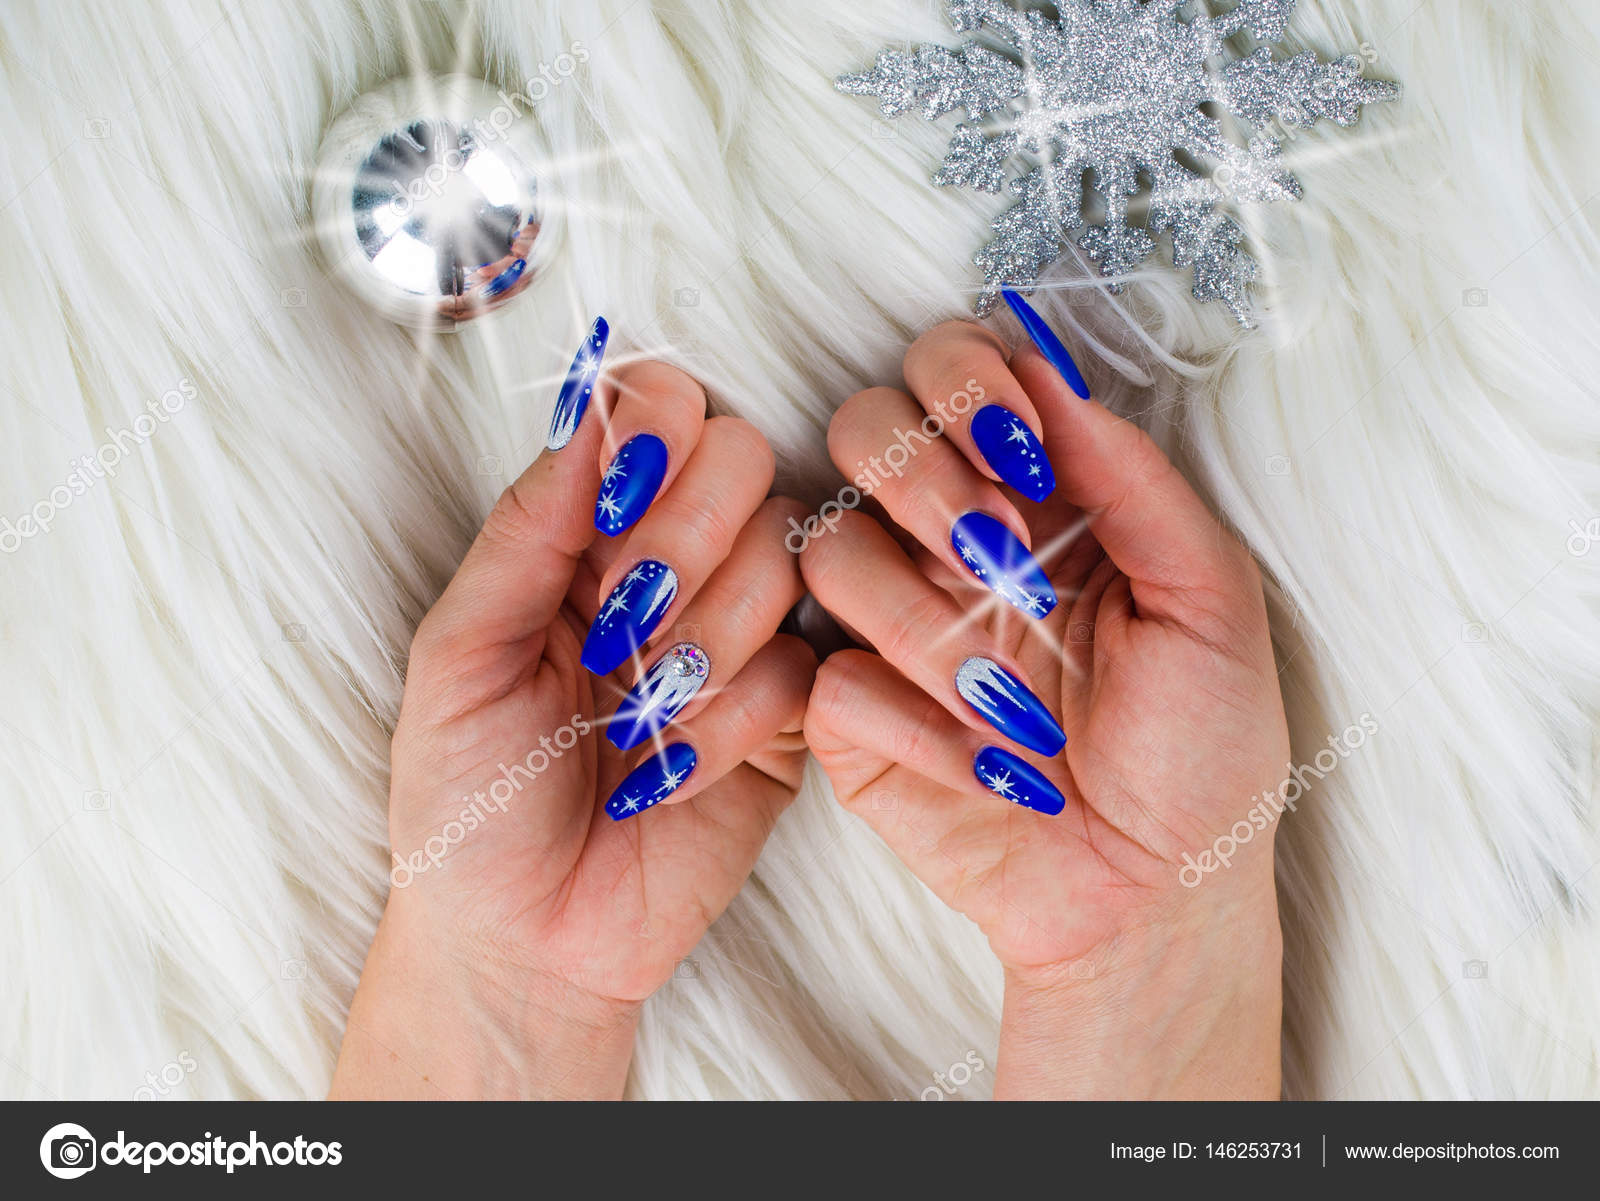 Fotos Pubis Decorados Uñas Navidad Azul Foto De Stock Pmmart